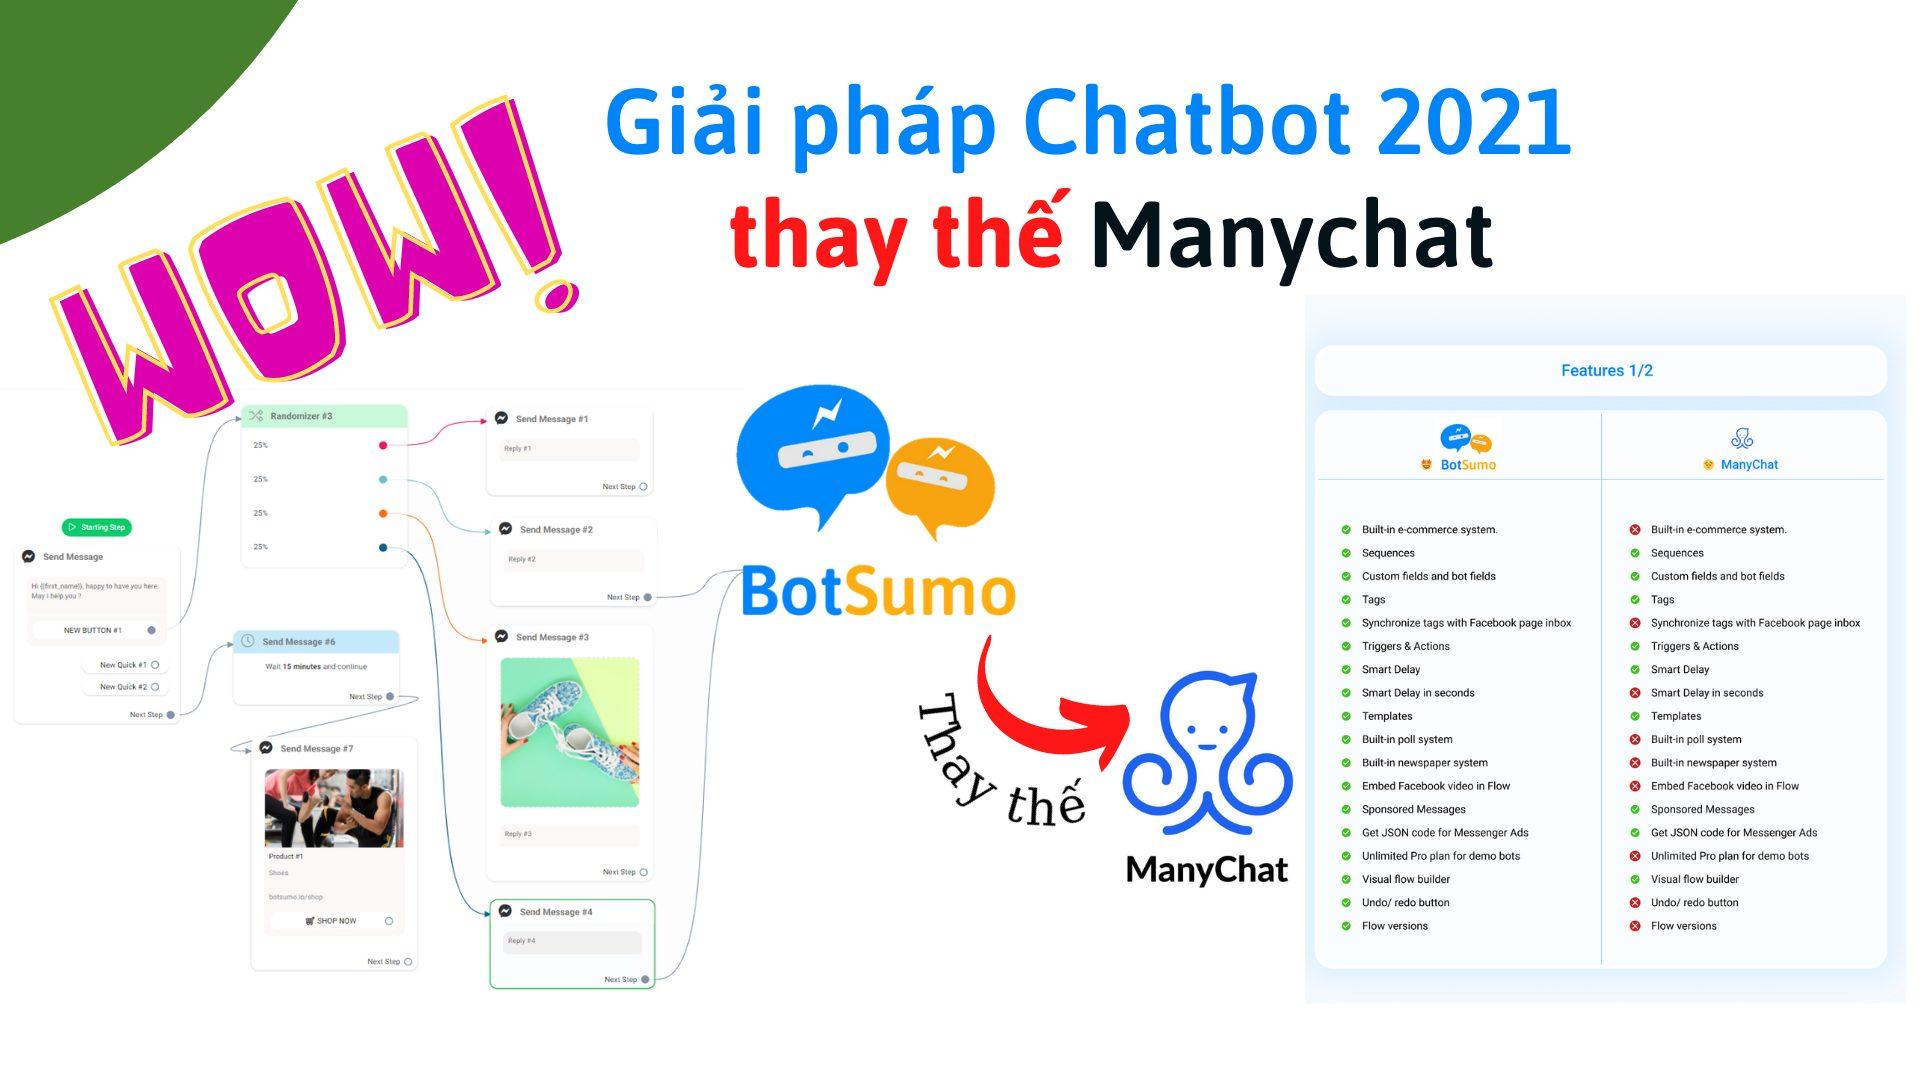 nen-tang-botsumo-chatbot-thay-the-manychat-2021-nammark